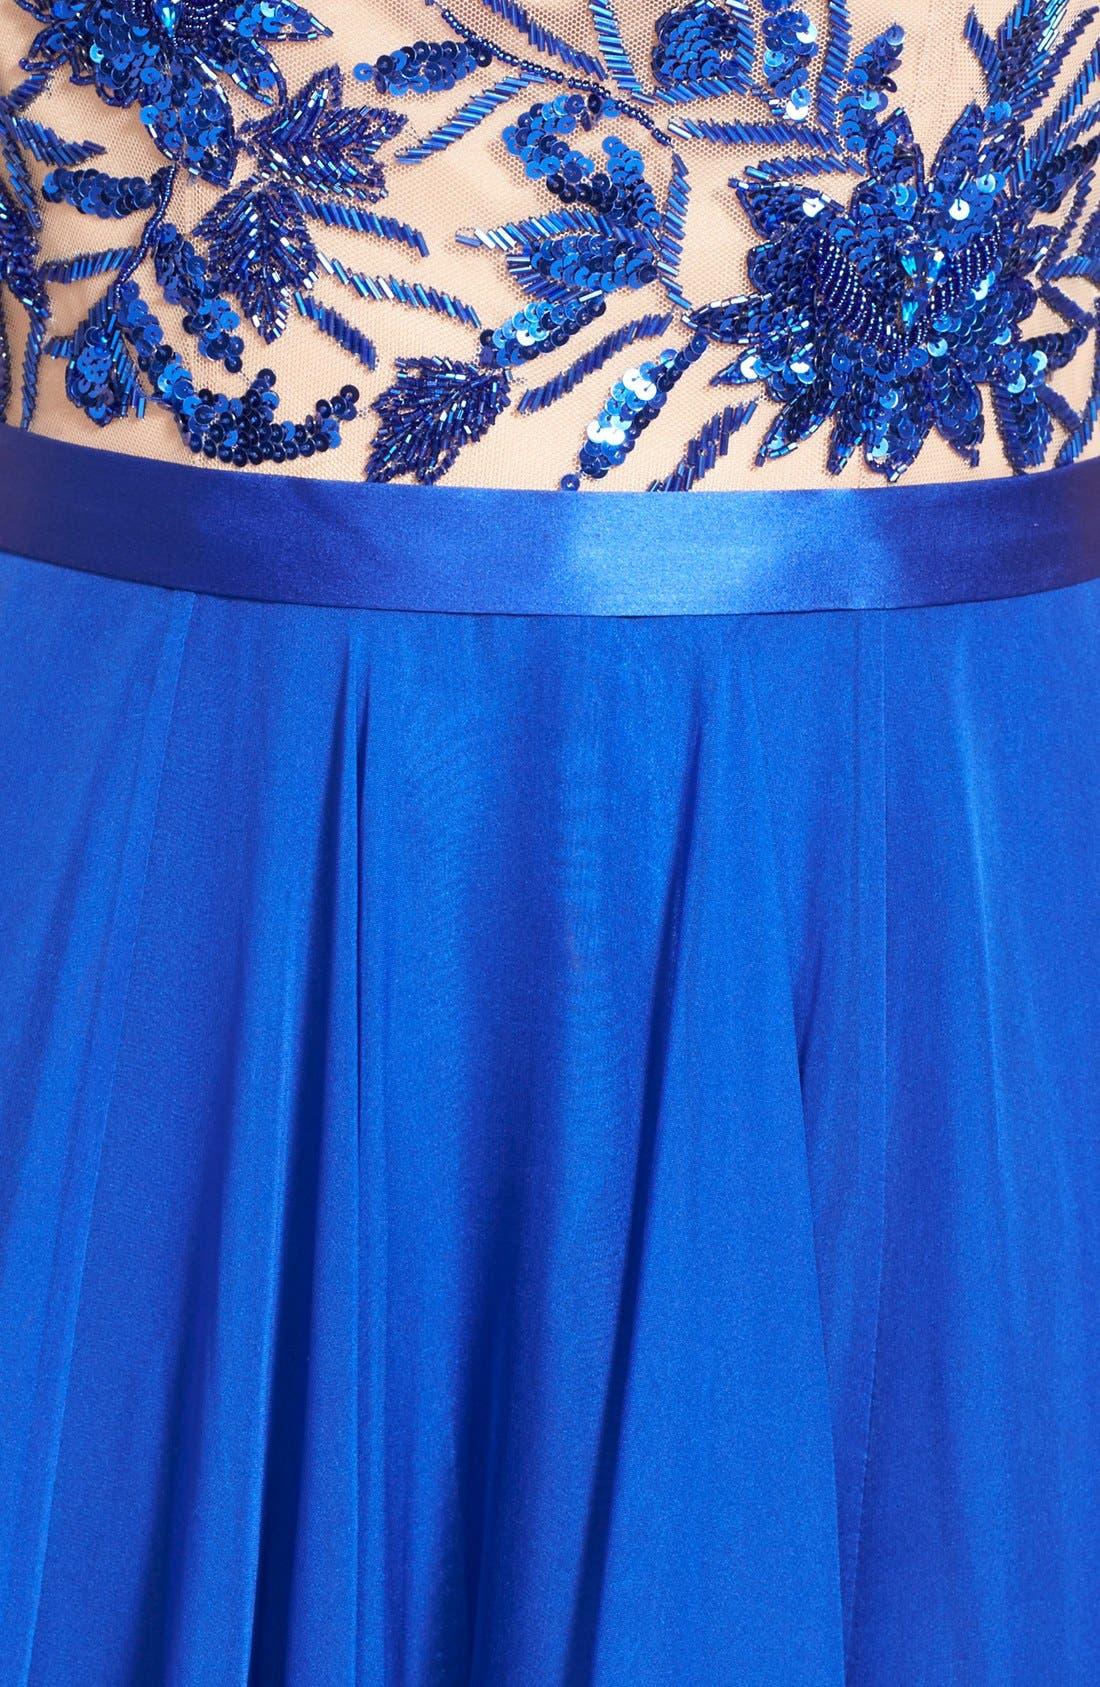 Alternate Image 3  - Sherri Hill Embellished Illusion Gown